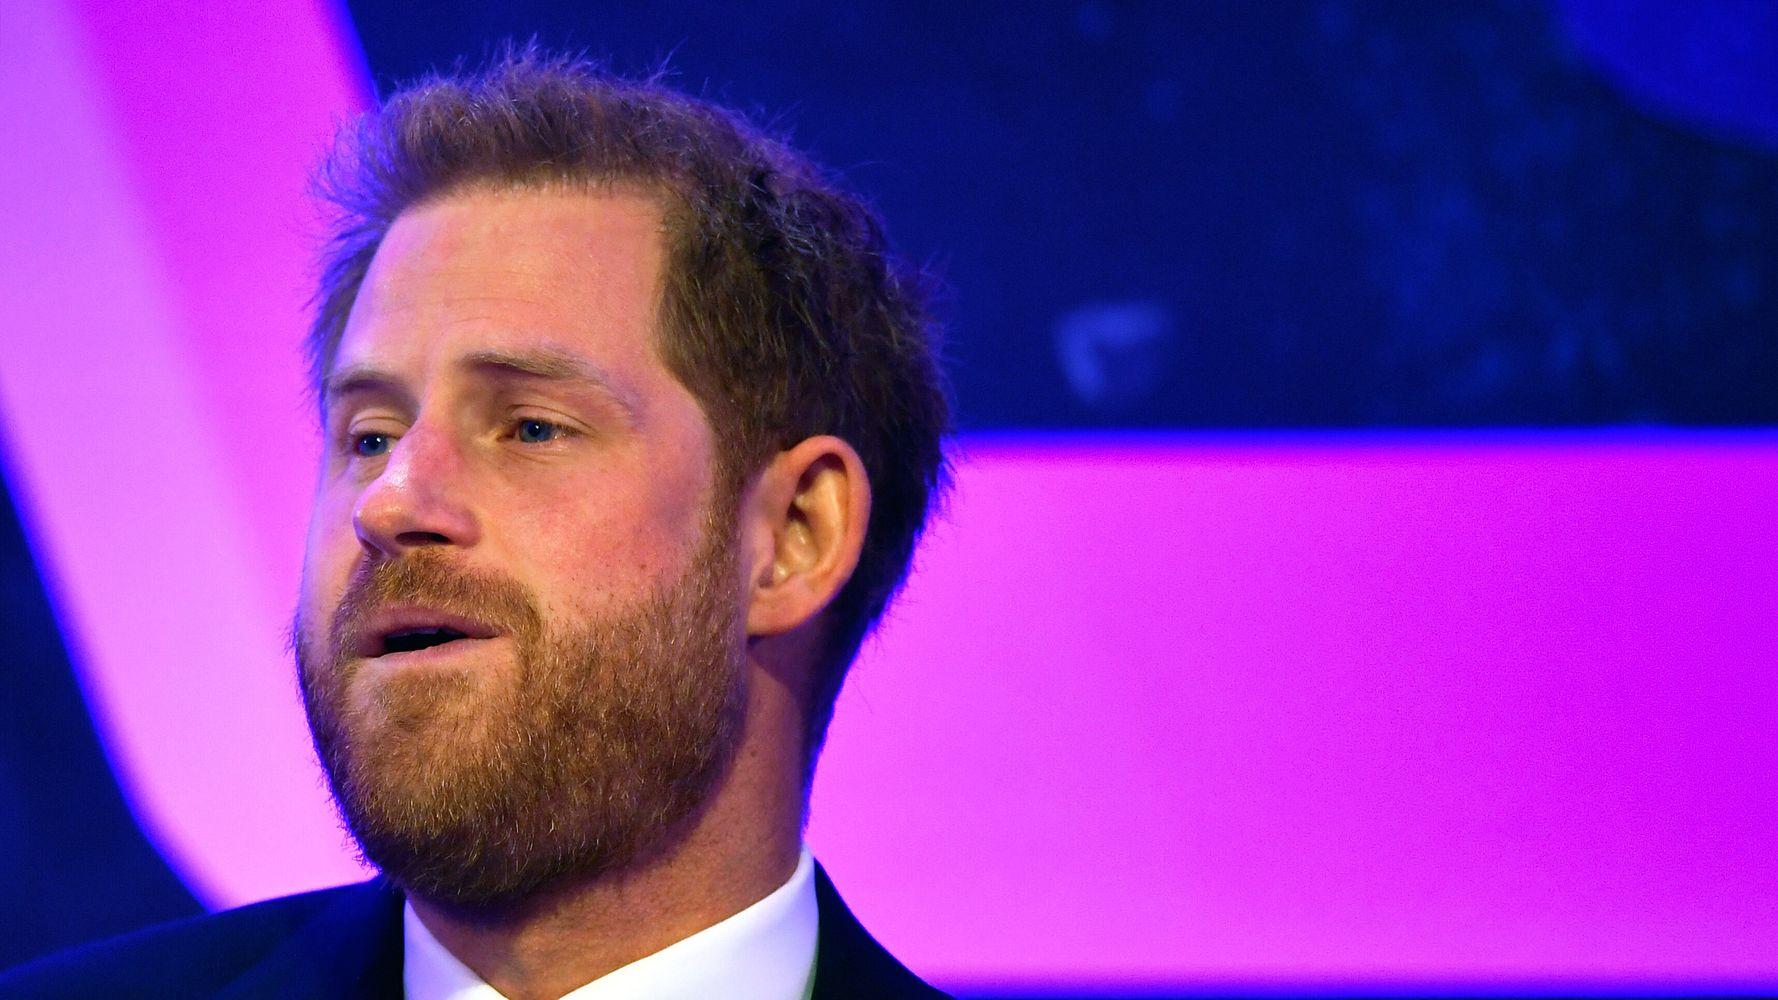 Prince Harry Breaks Down As He Shares How Fatherhood Has Changed Him